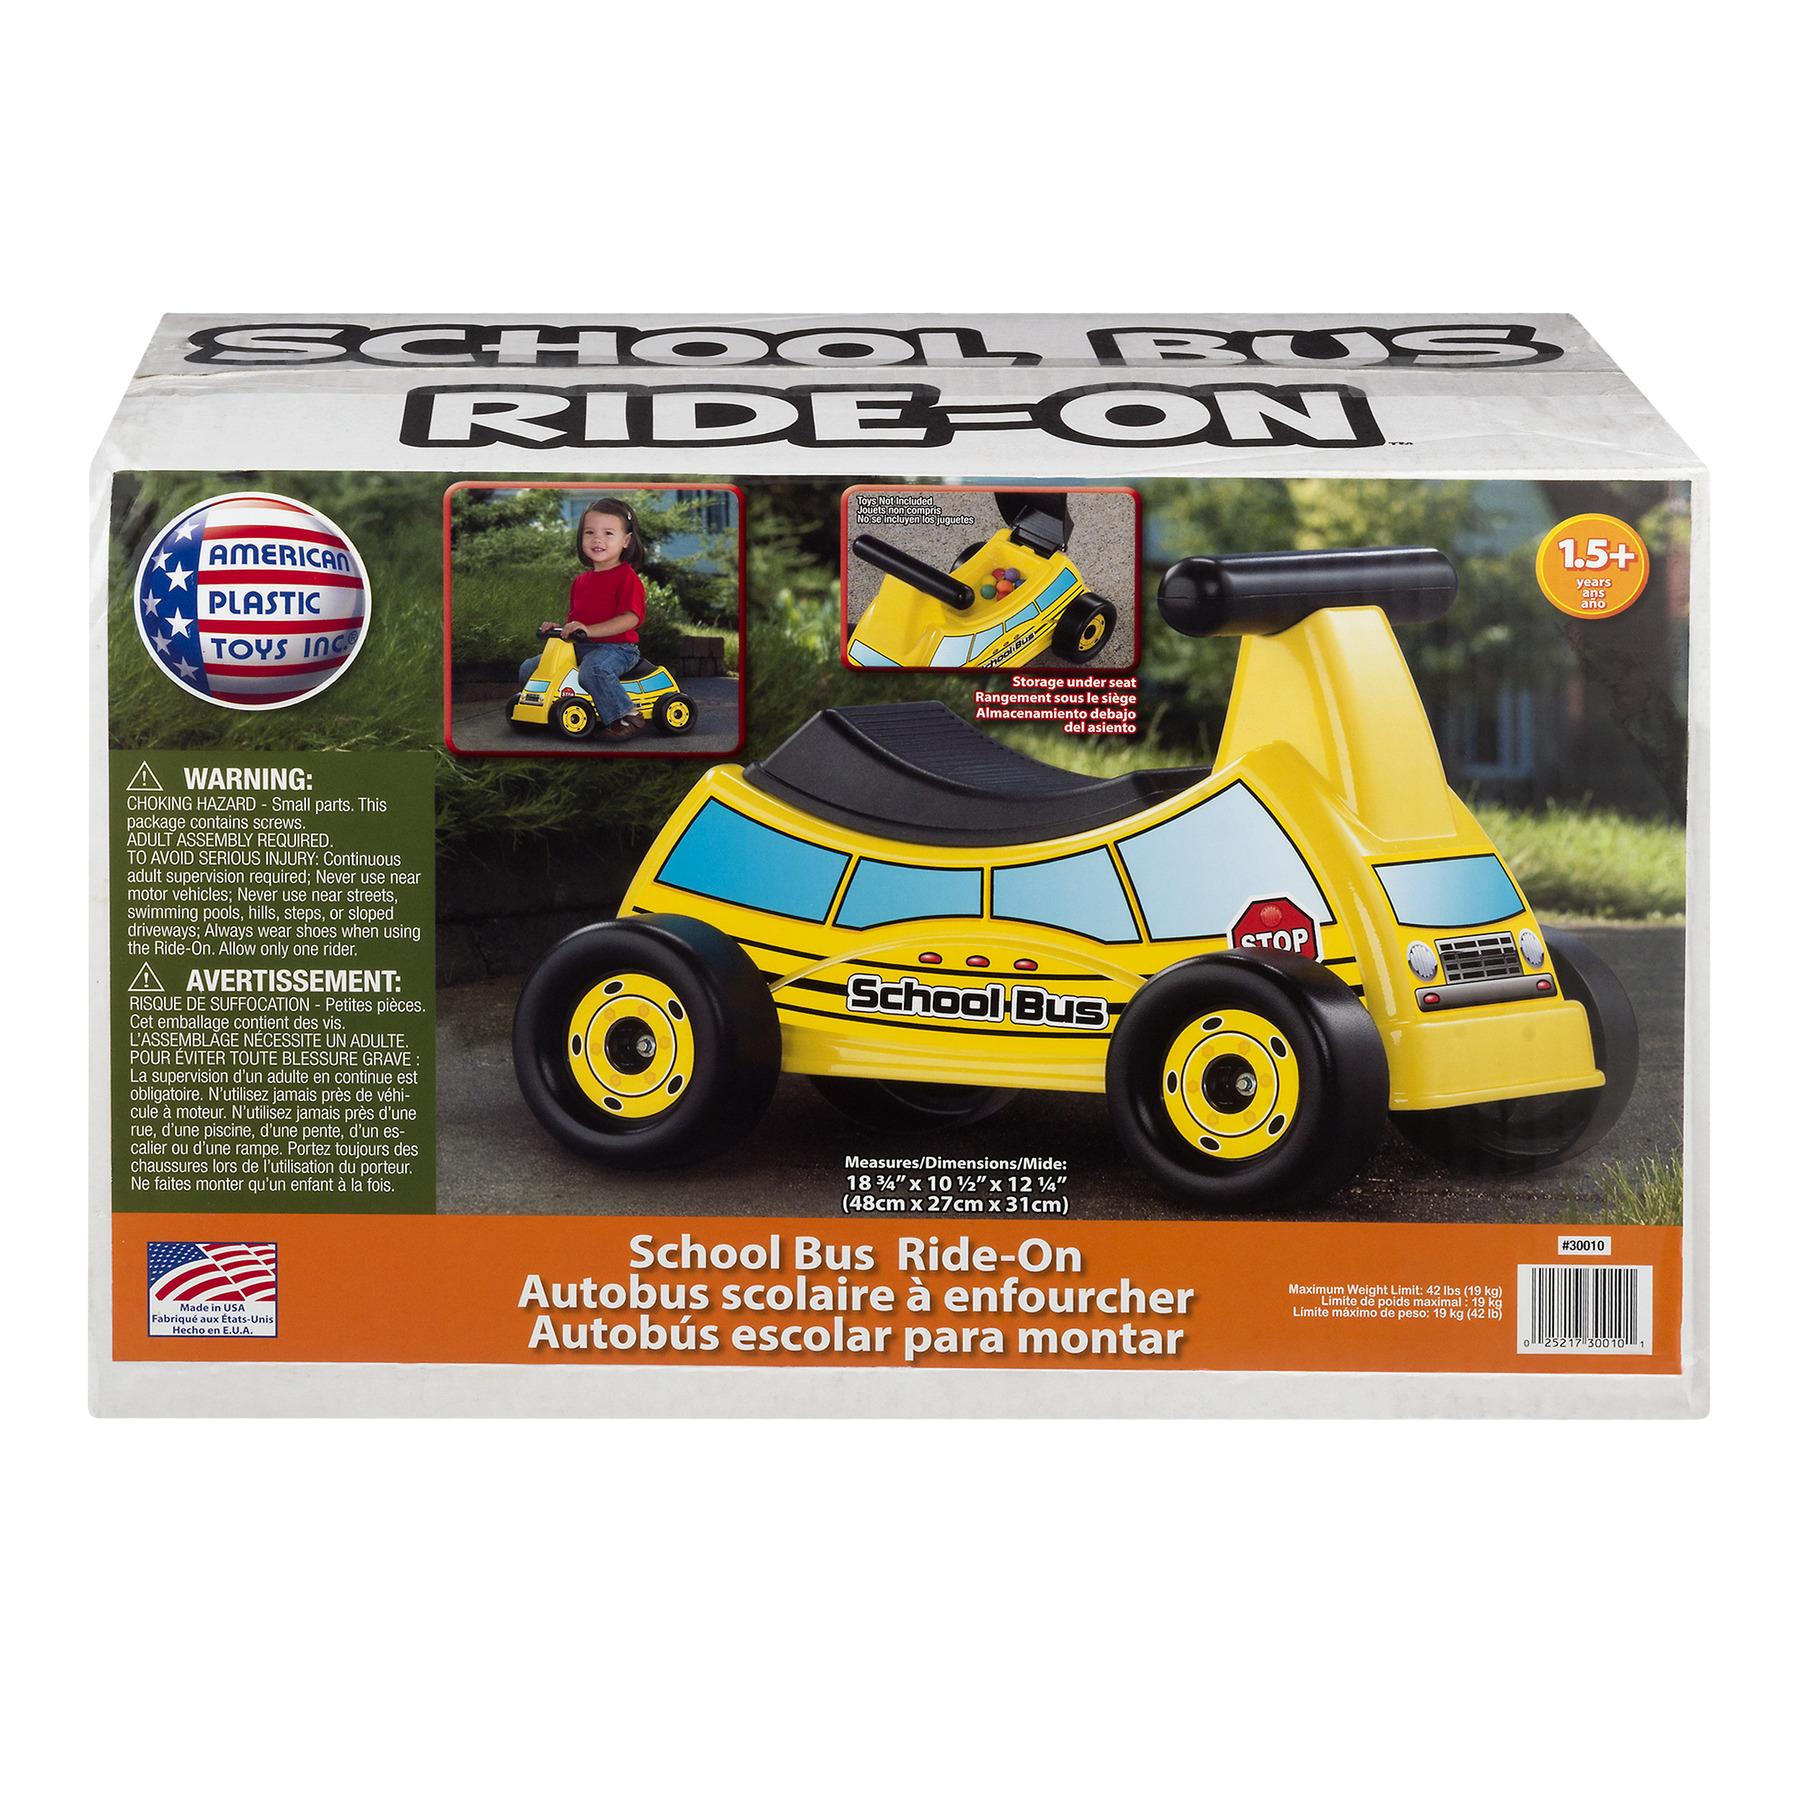 American Plastic Toy School Bus Ride-On, 1.0 CT